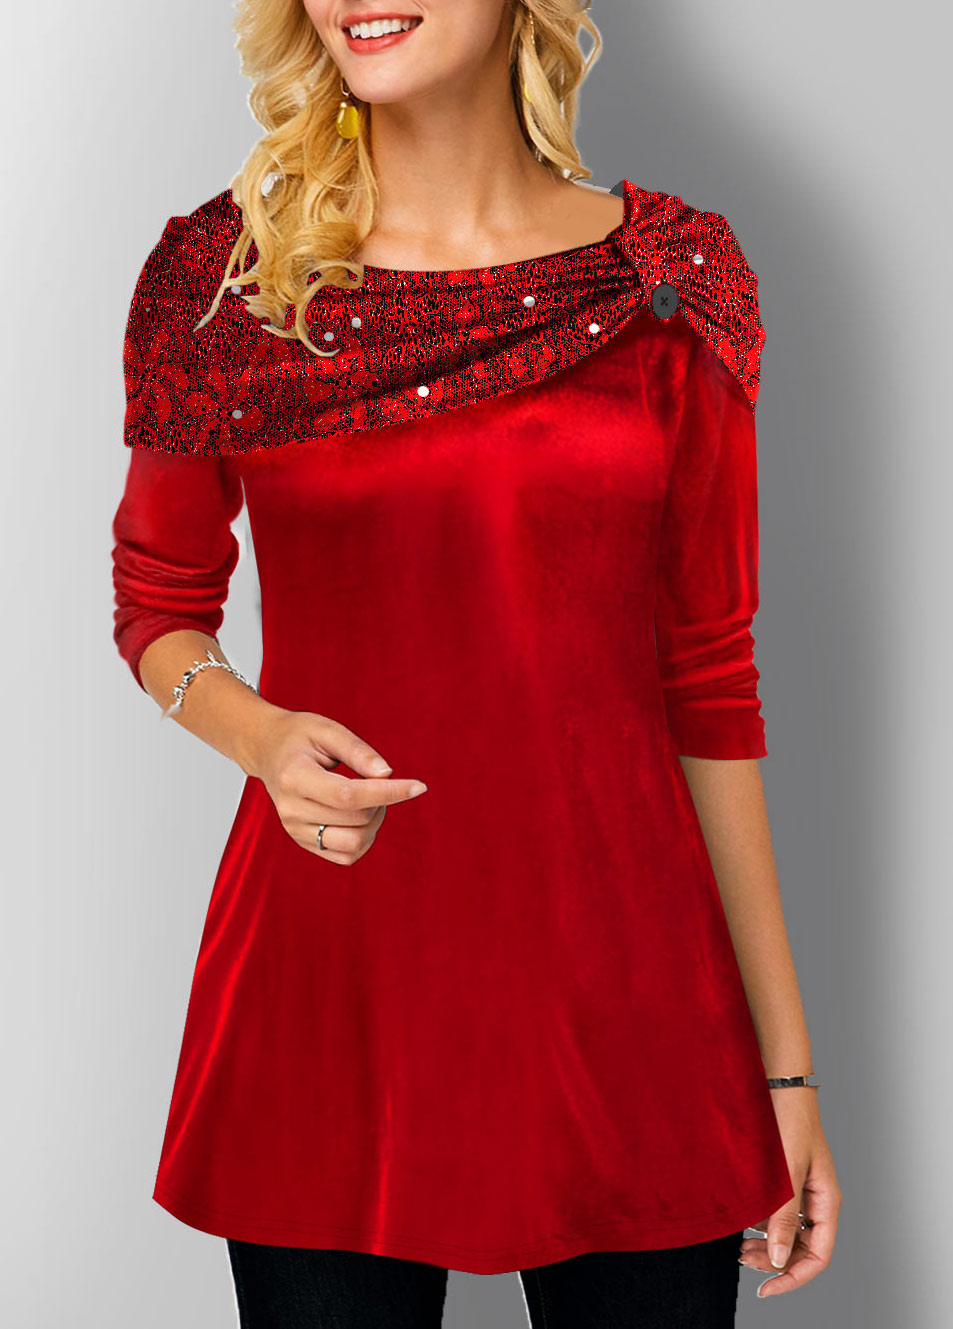 Velvet Stitching Long Sleeve Tunic Top